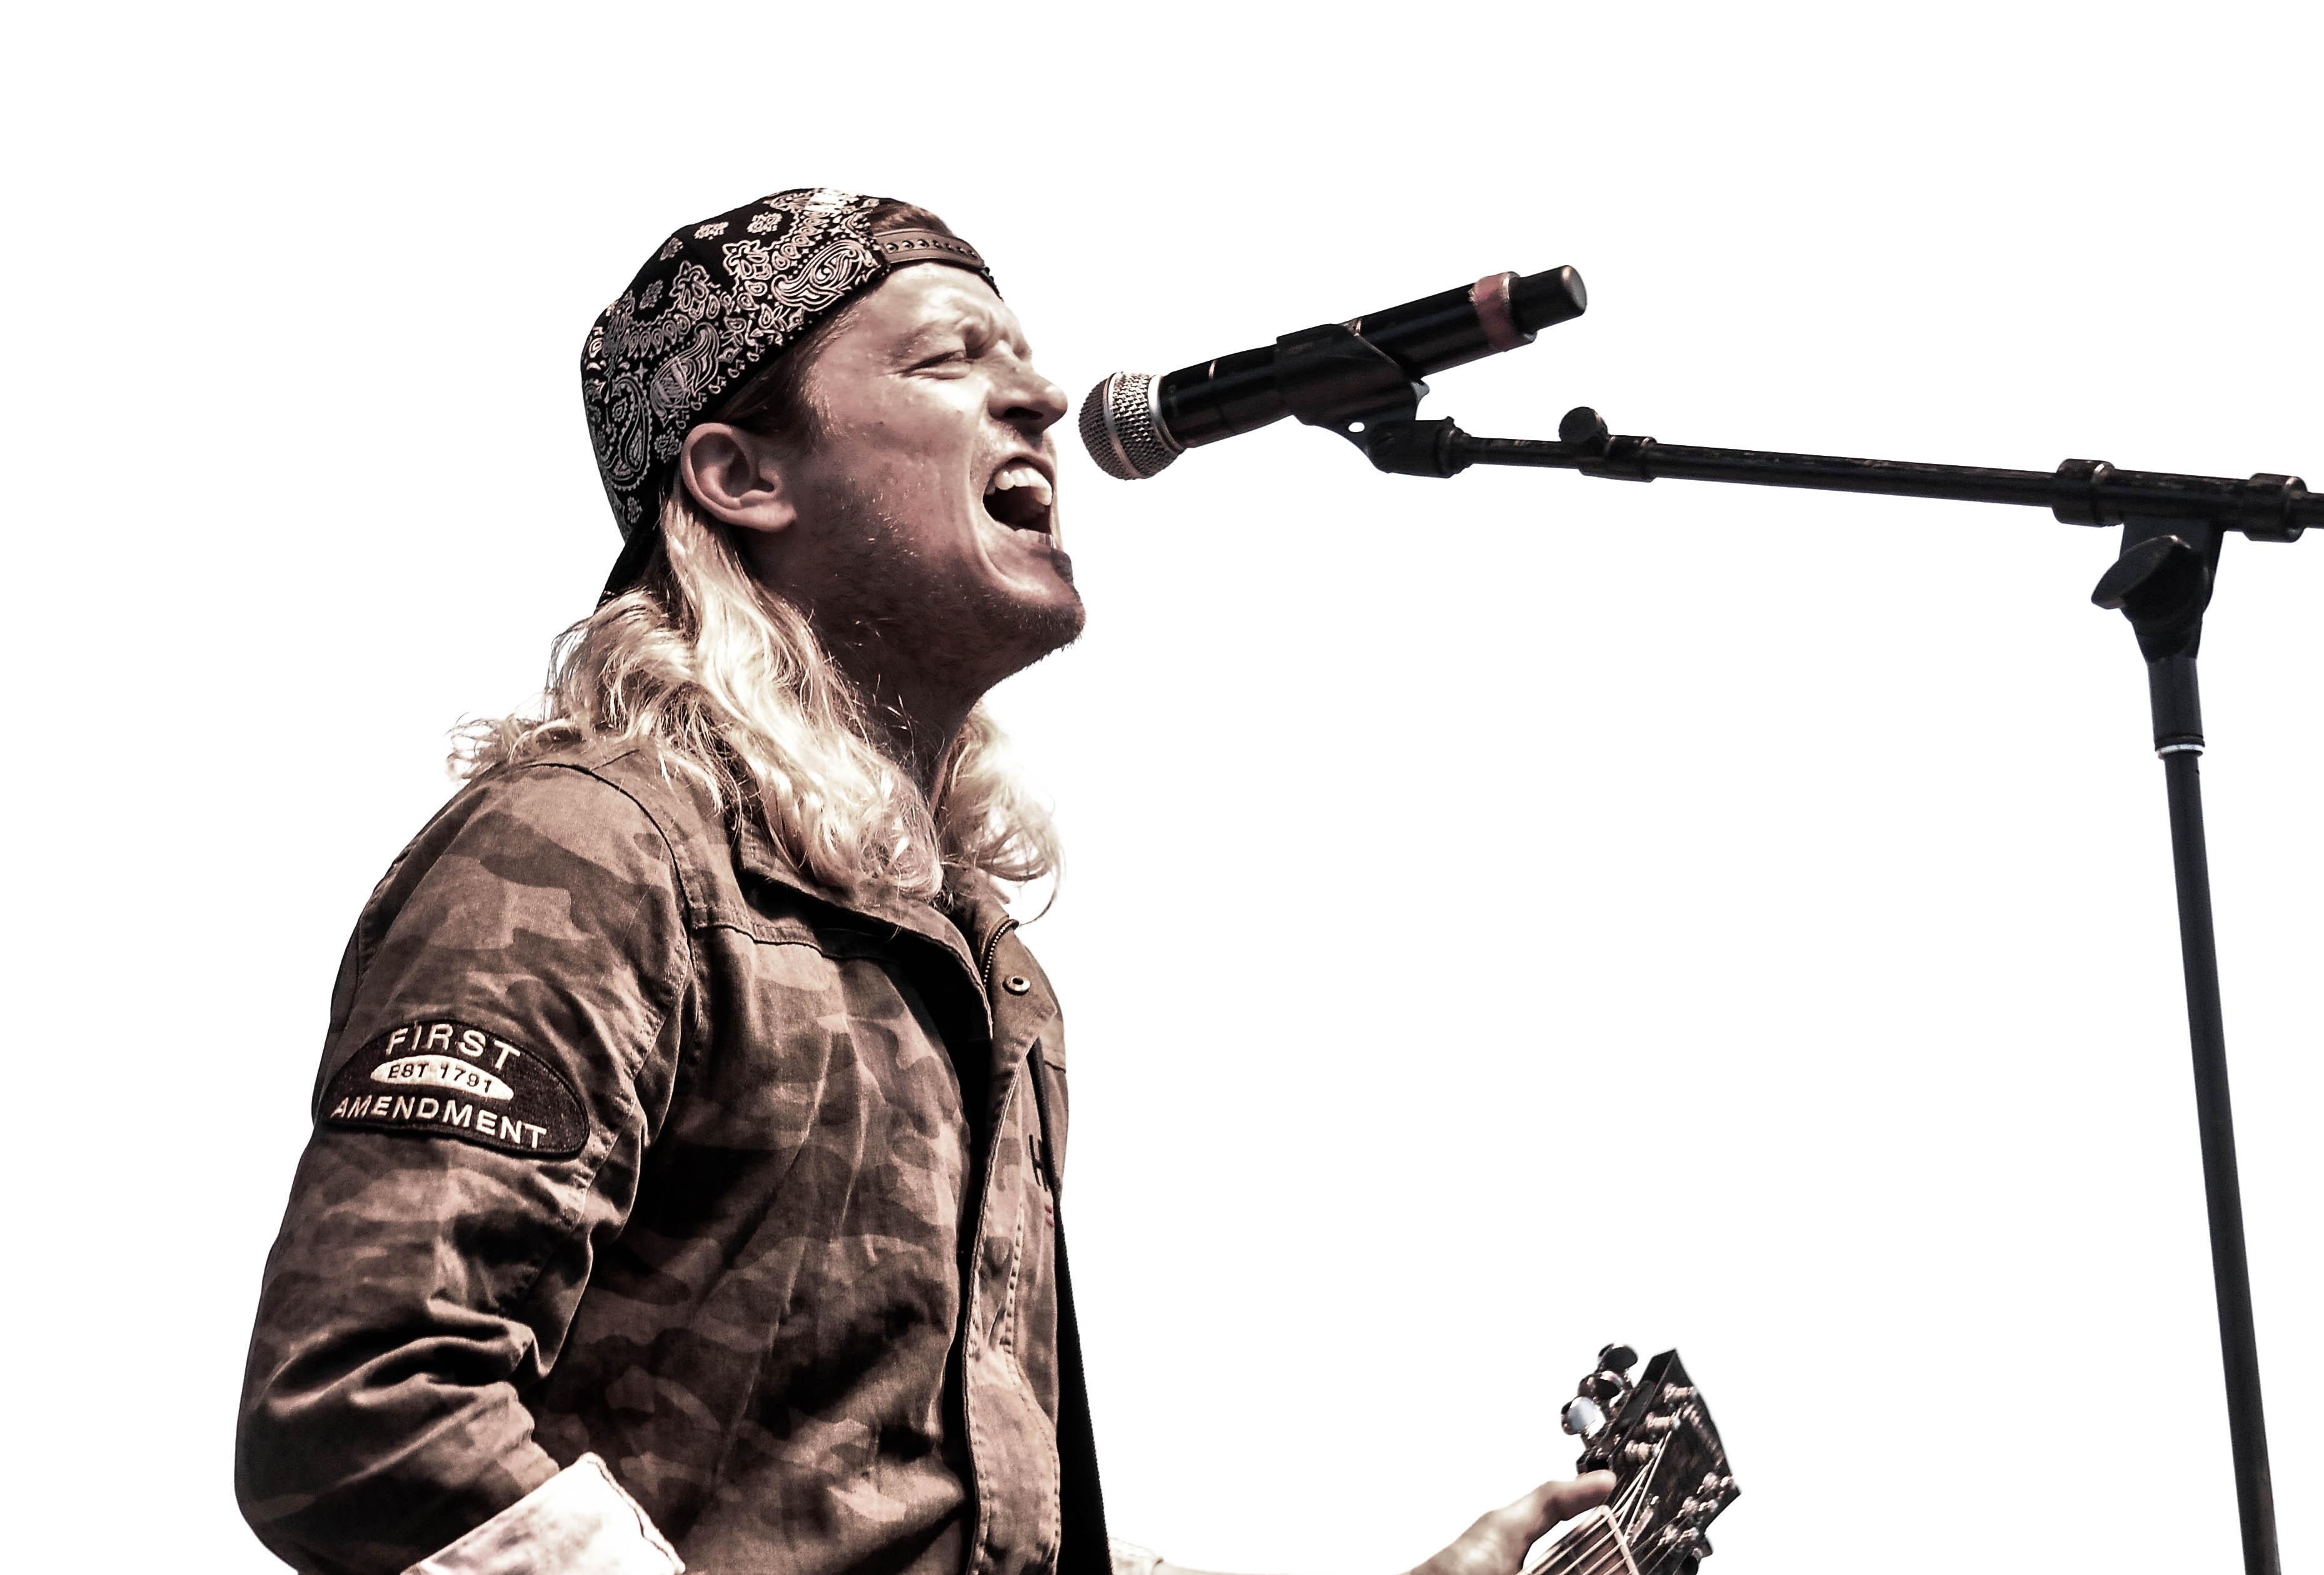 Puddle Of Mudd Come Clean in Batavia | Rock Show Critique